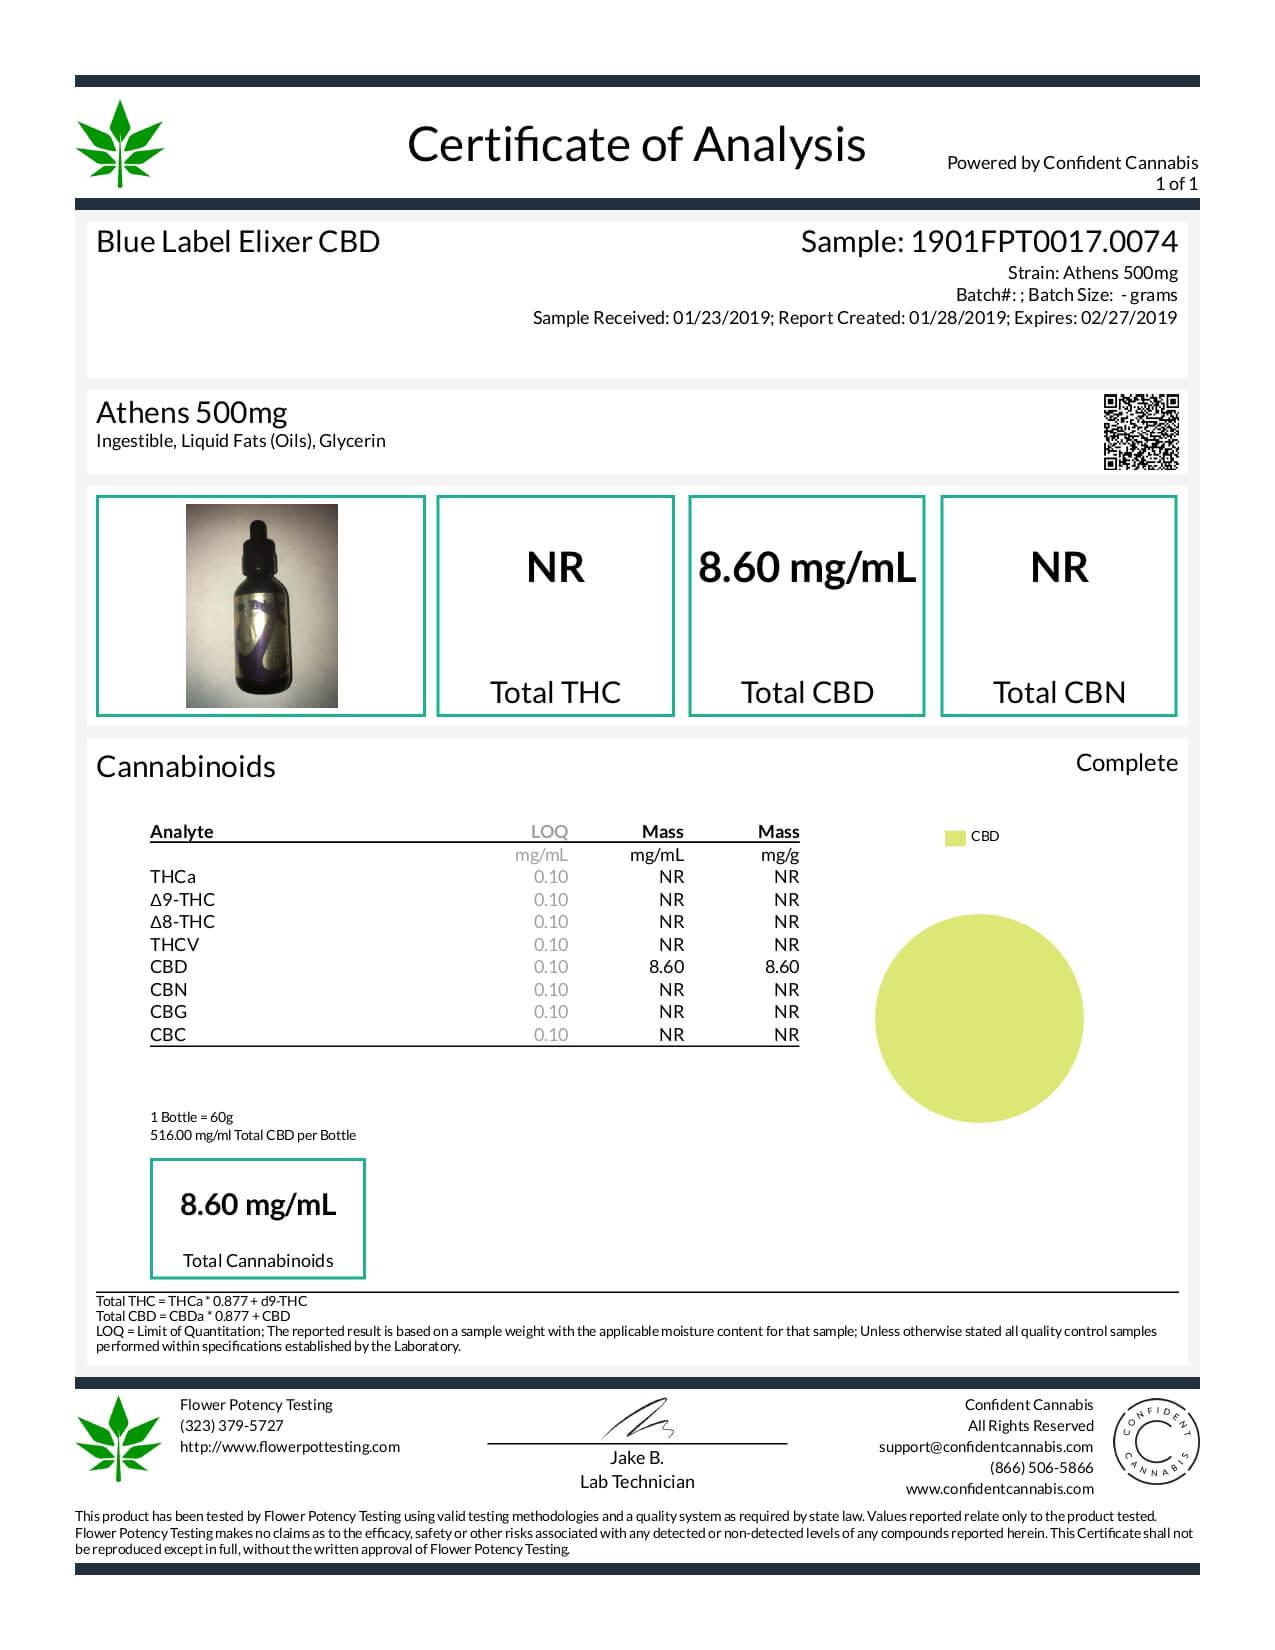 Blue Label CBD Vape Juice Athens 500mg Lab Report